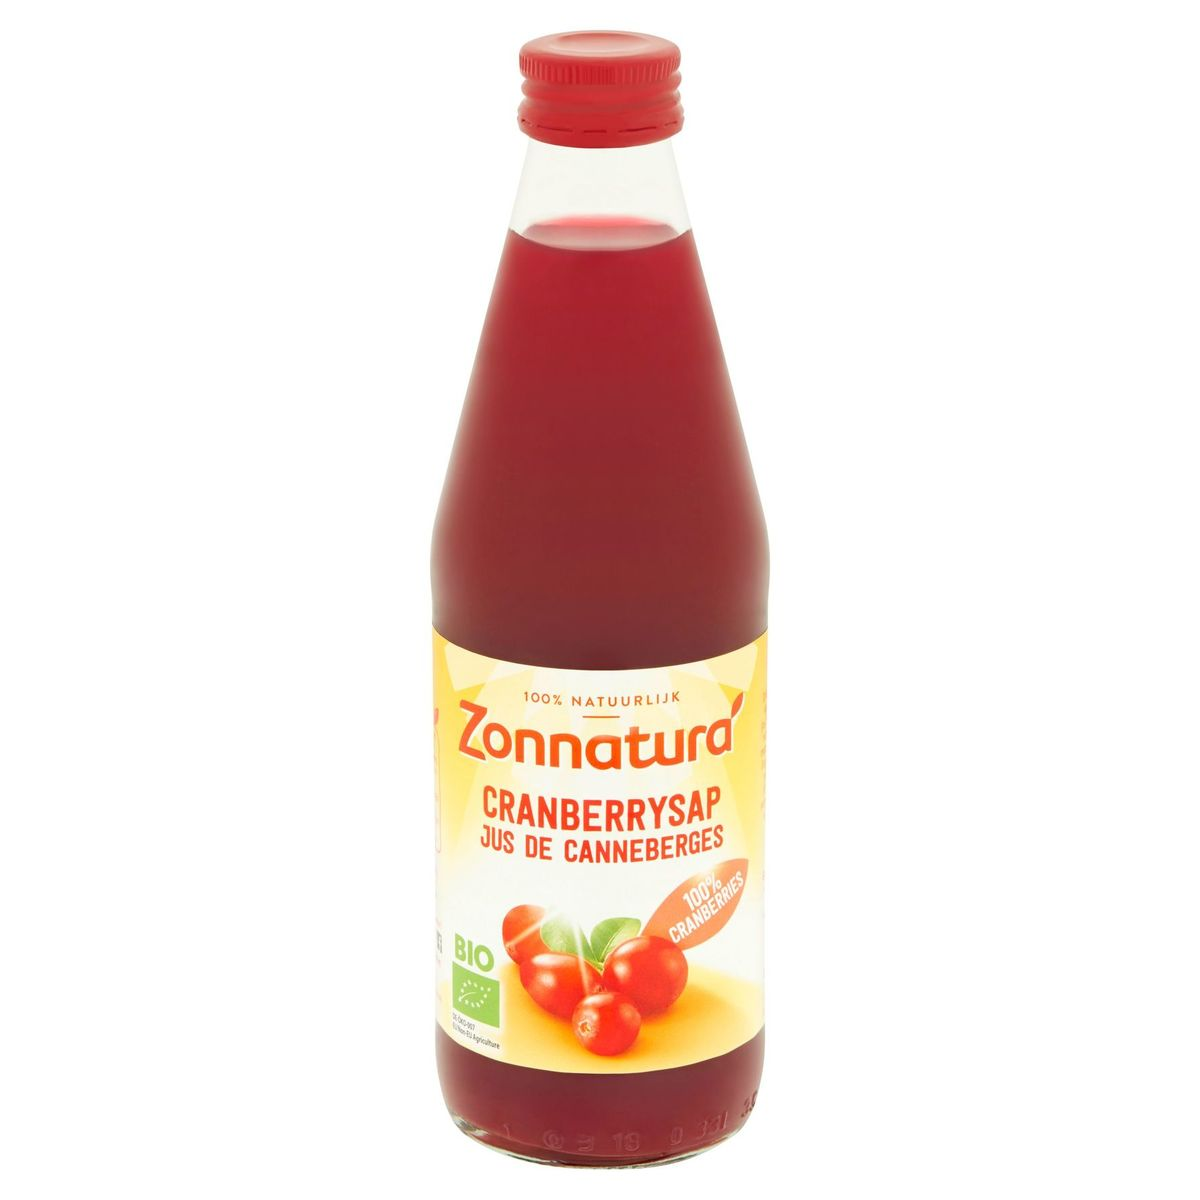 Zonnatura Bio Jus de Canneberges 330 ml